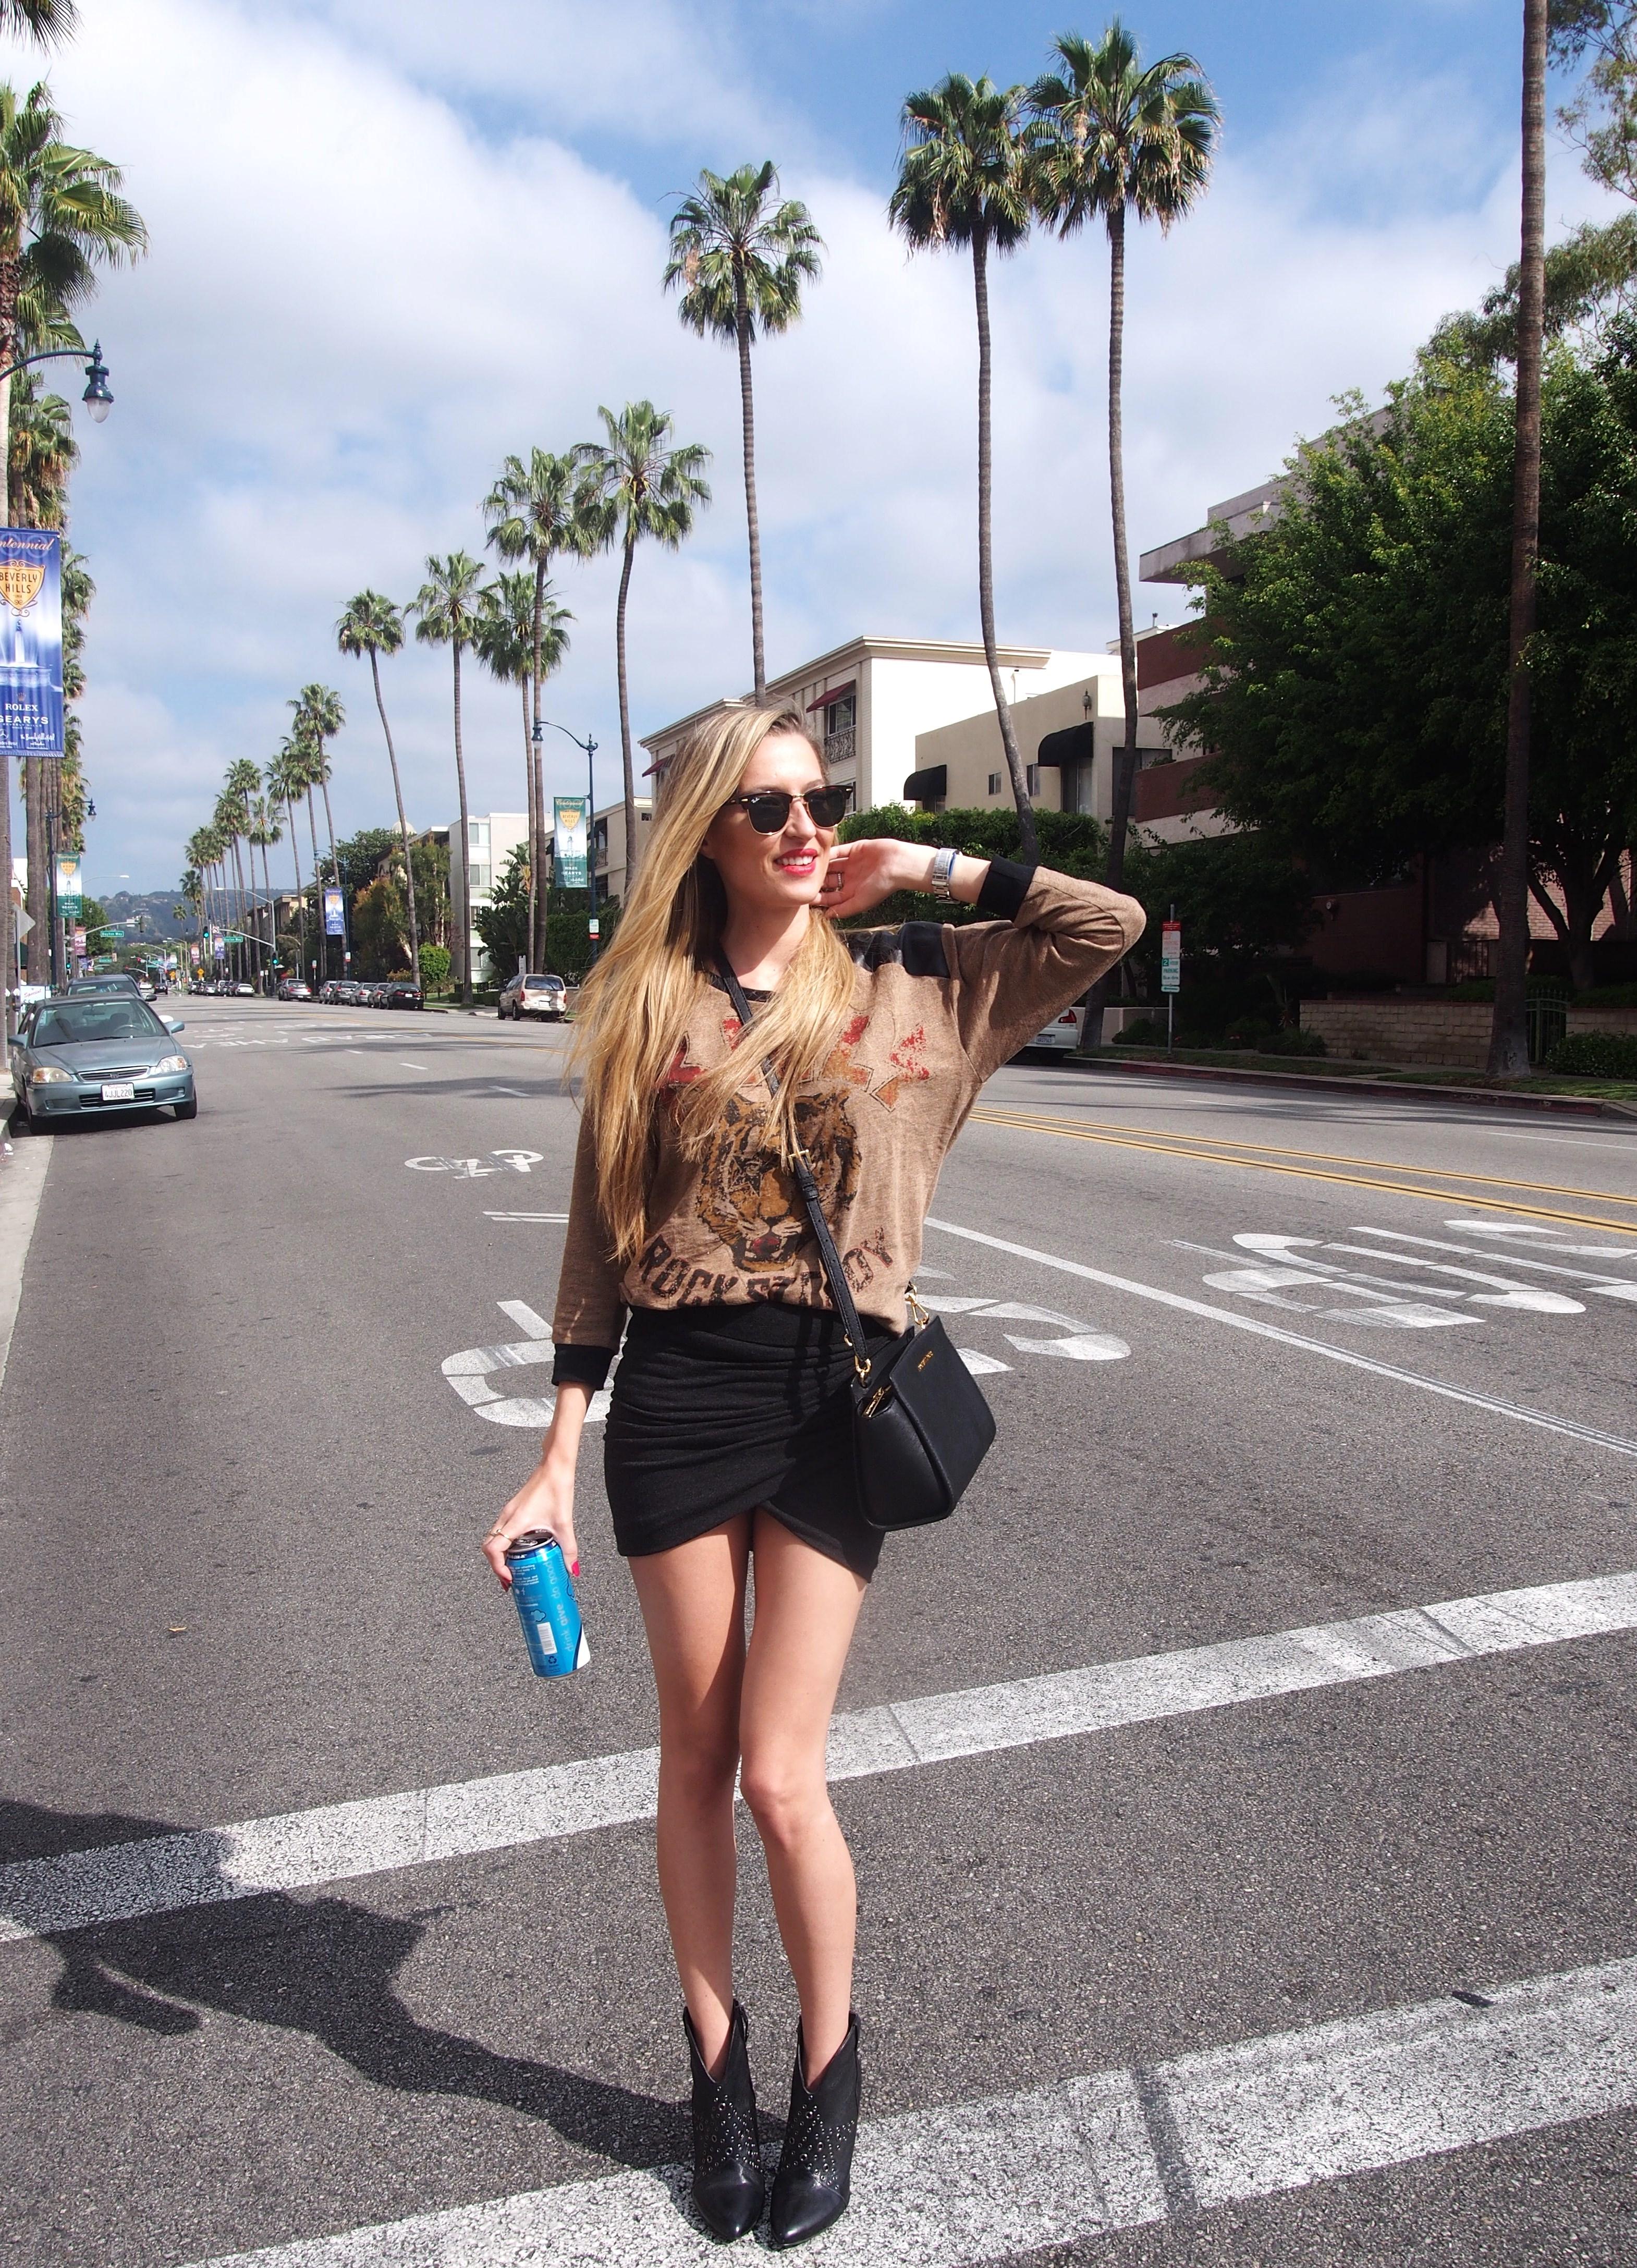 Palm_Trees_Los_Angeles_California_Ray_Ban_Hoodie_Venca_Michael_Kors_Booties_Guess_Lara_Martin_Gilarranz_Bymyheels